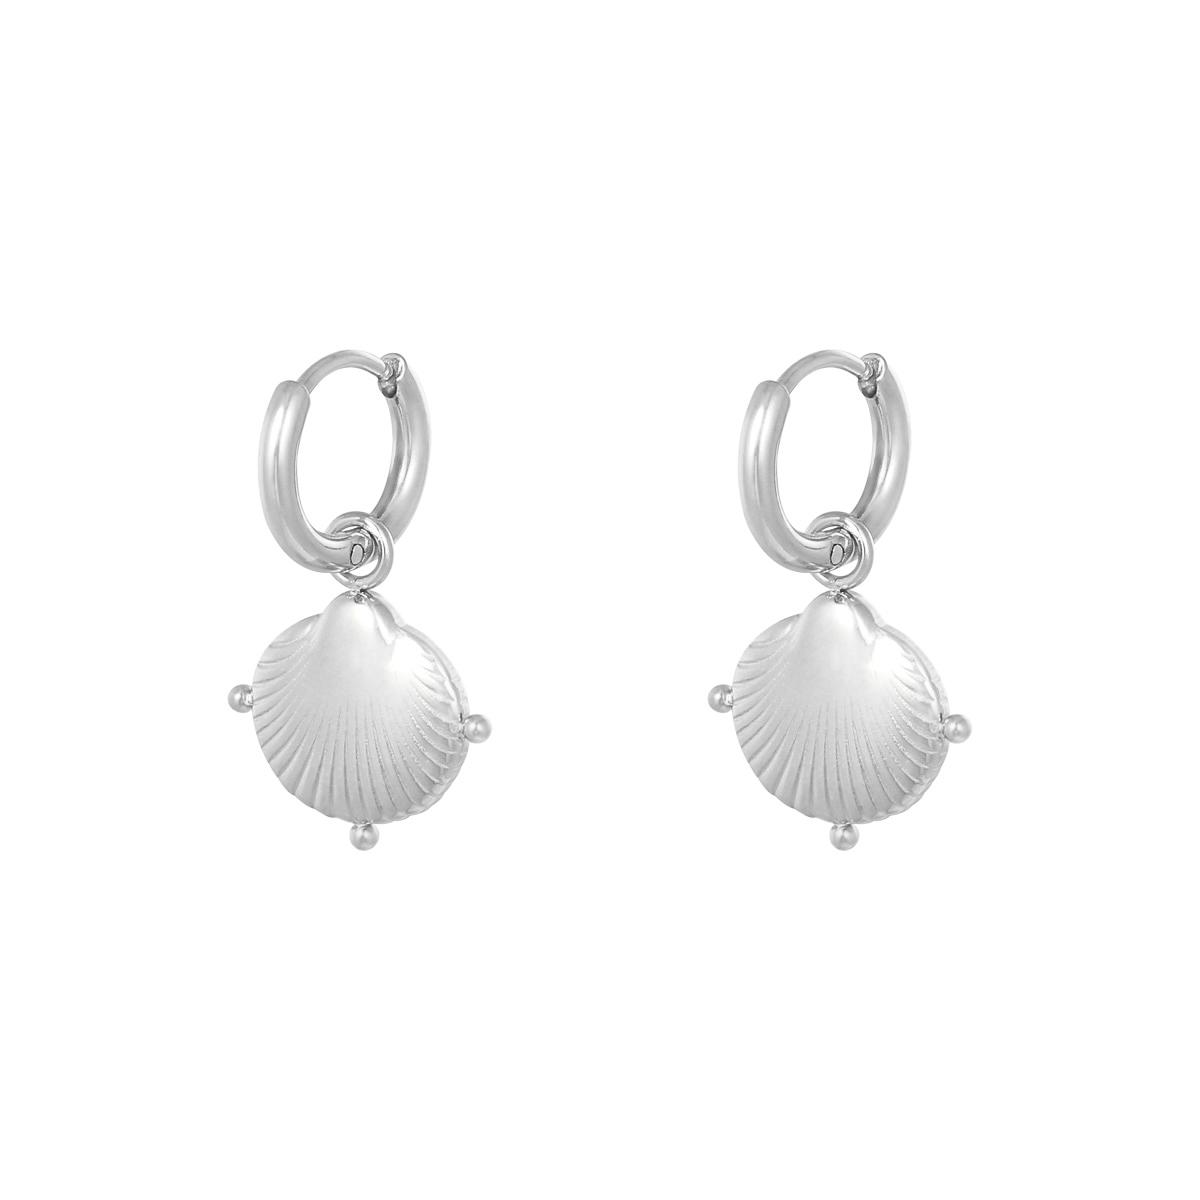 Boucles d'oreilles Clam Shell